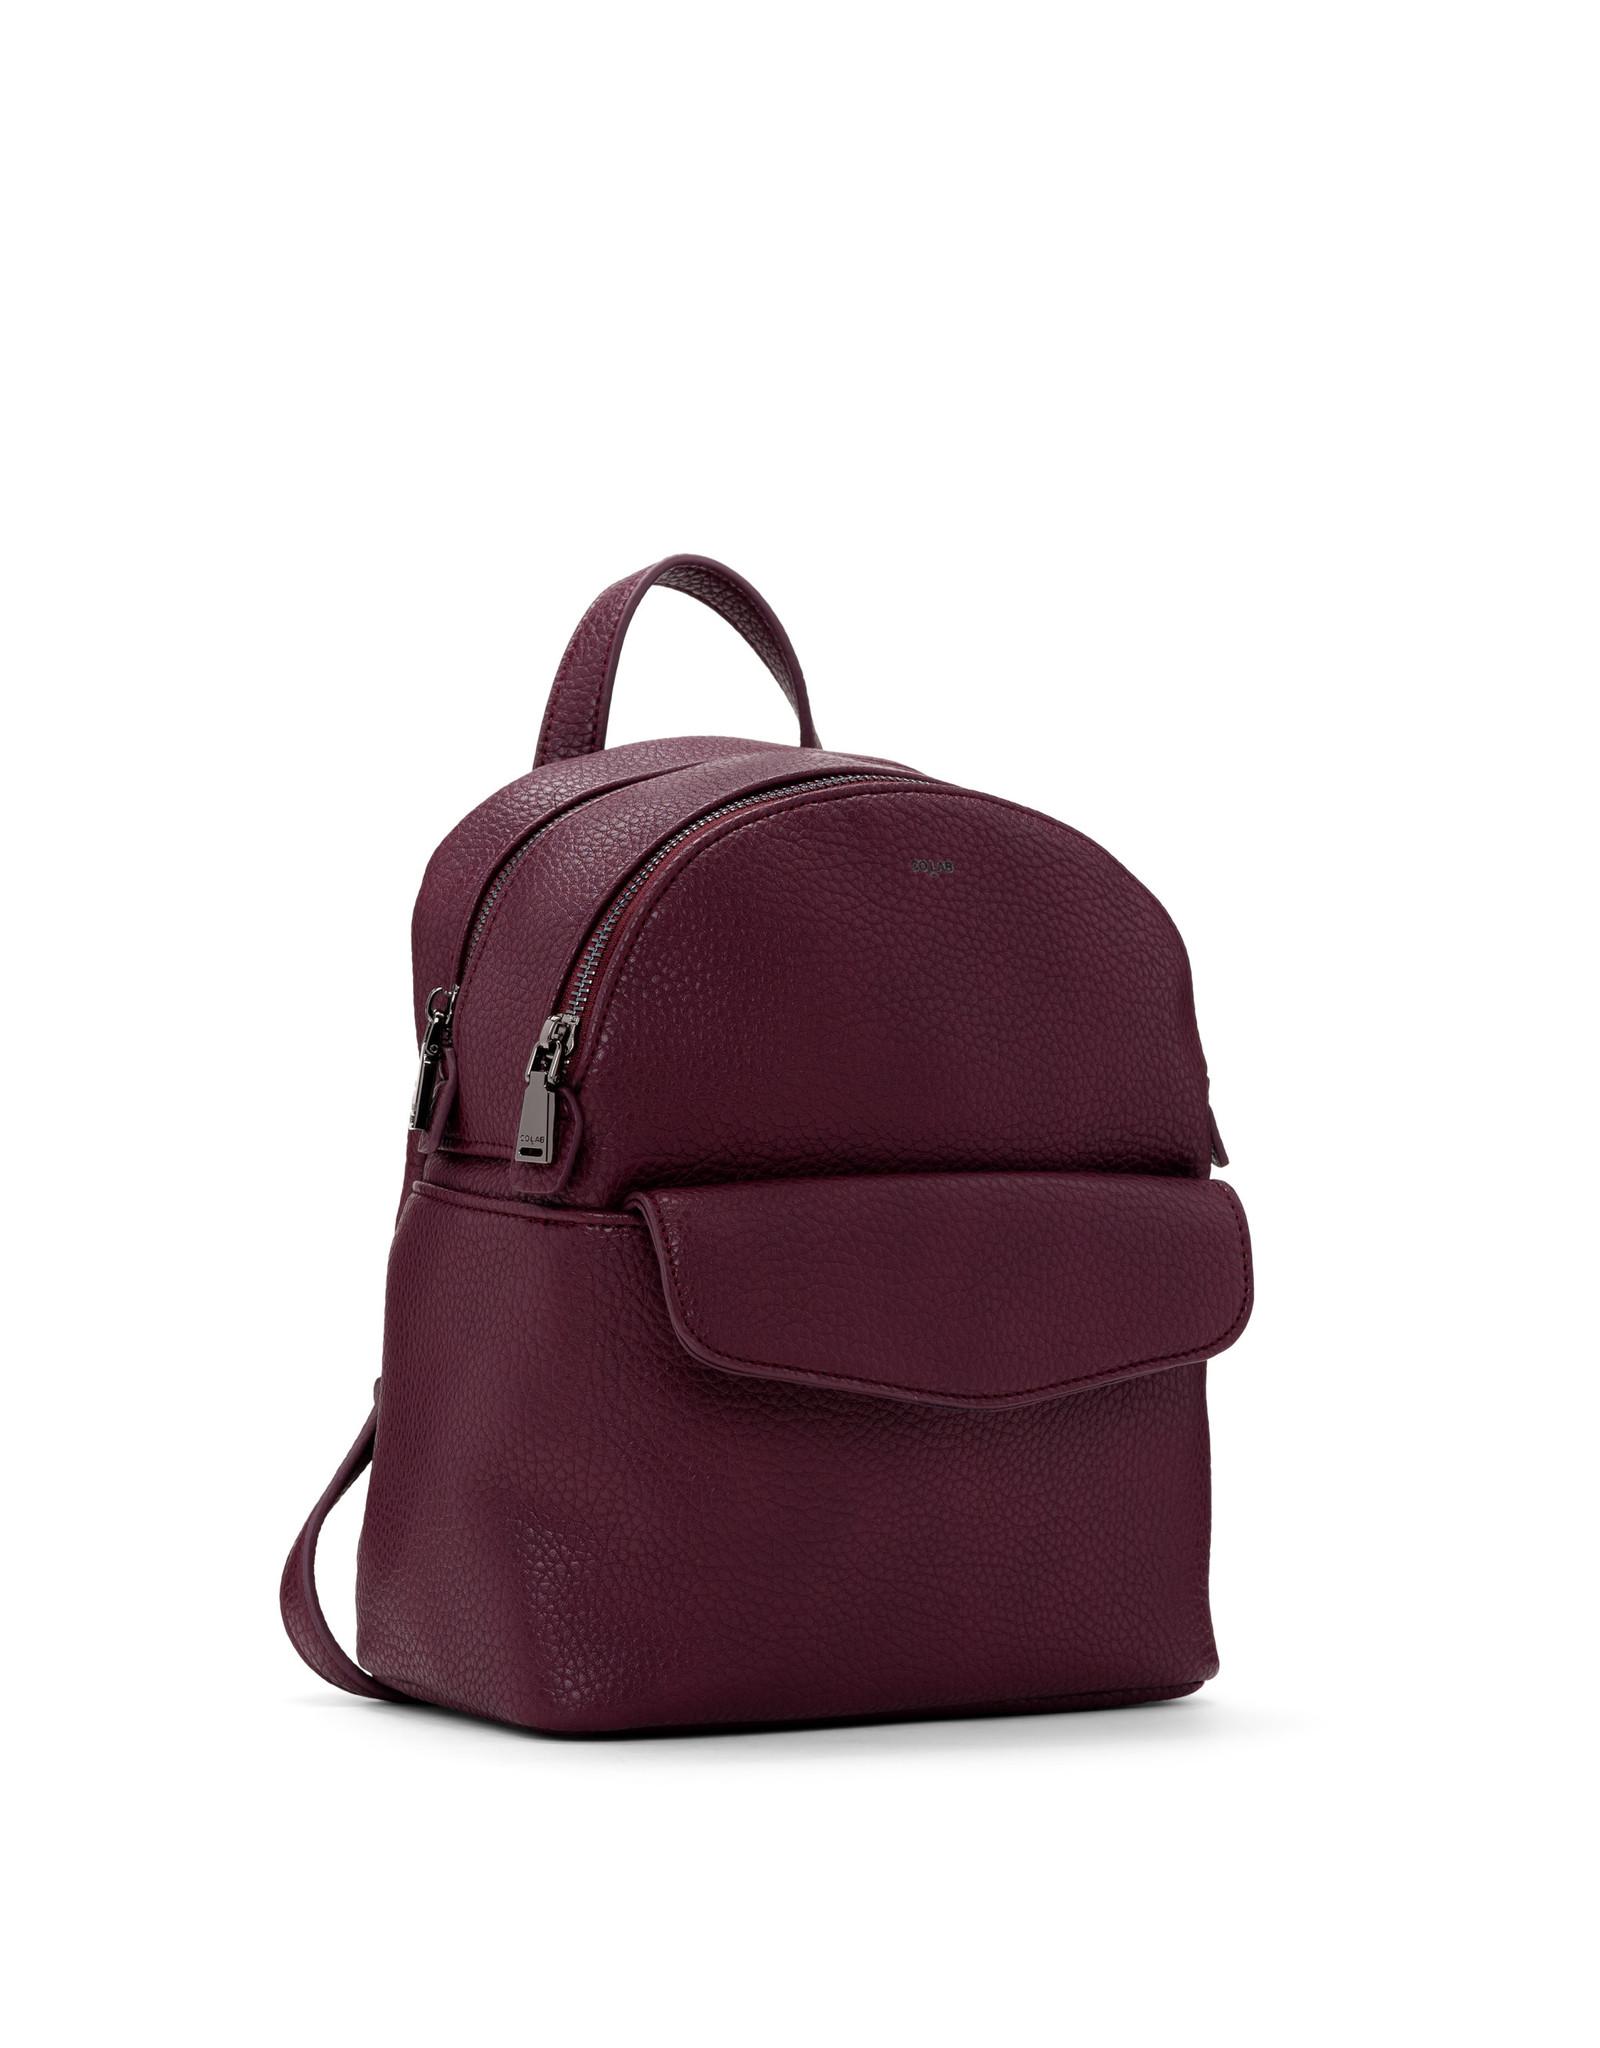 co-lab co-lab Pebble Mini Backpack